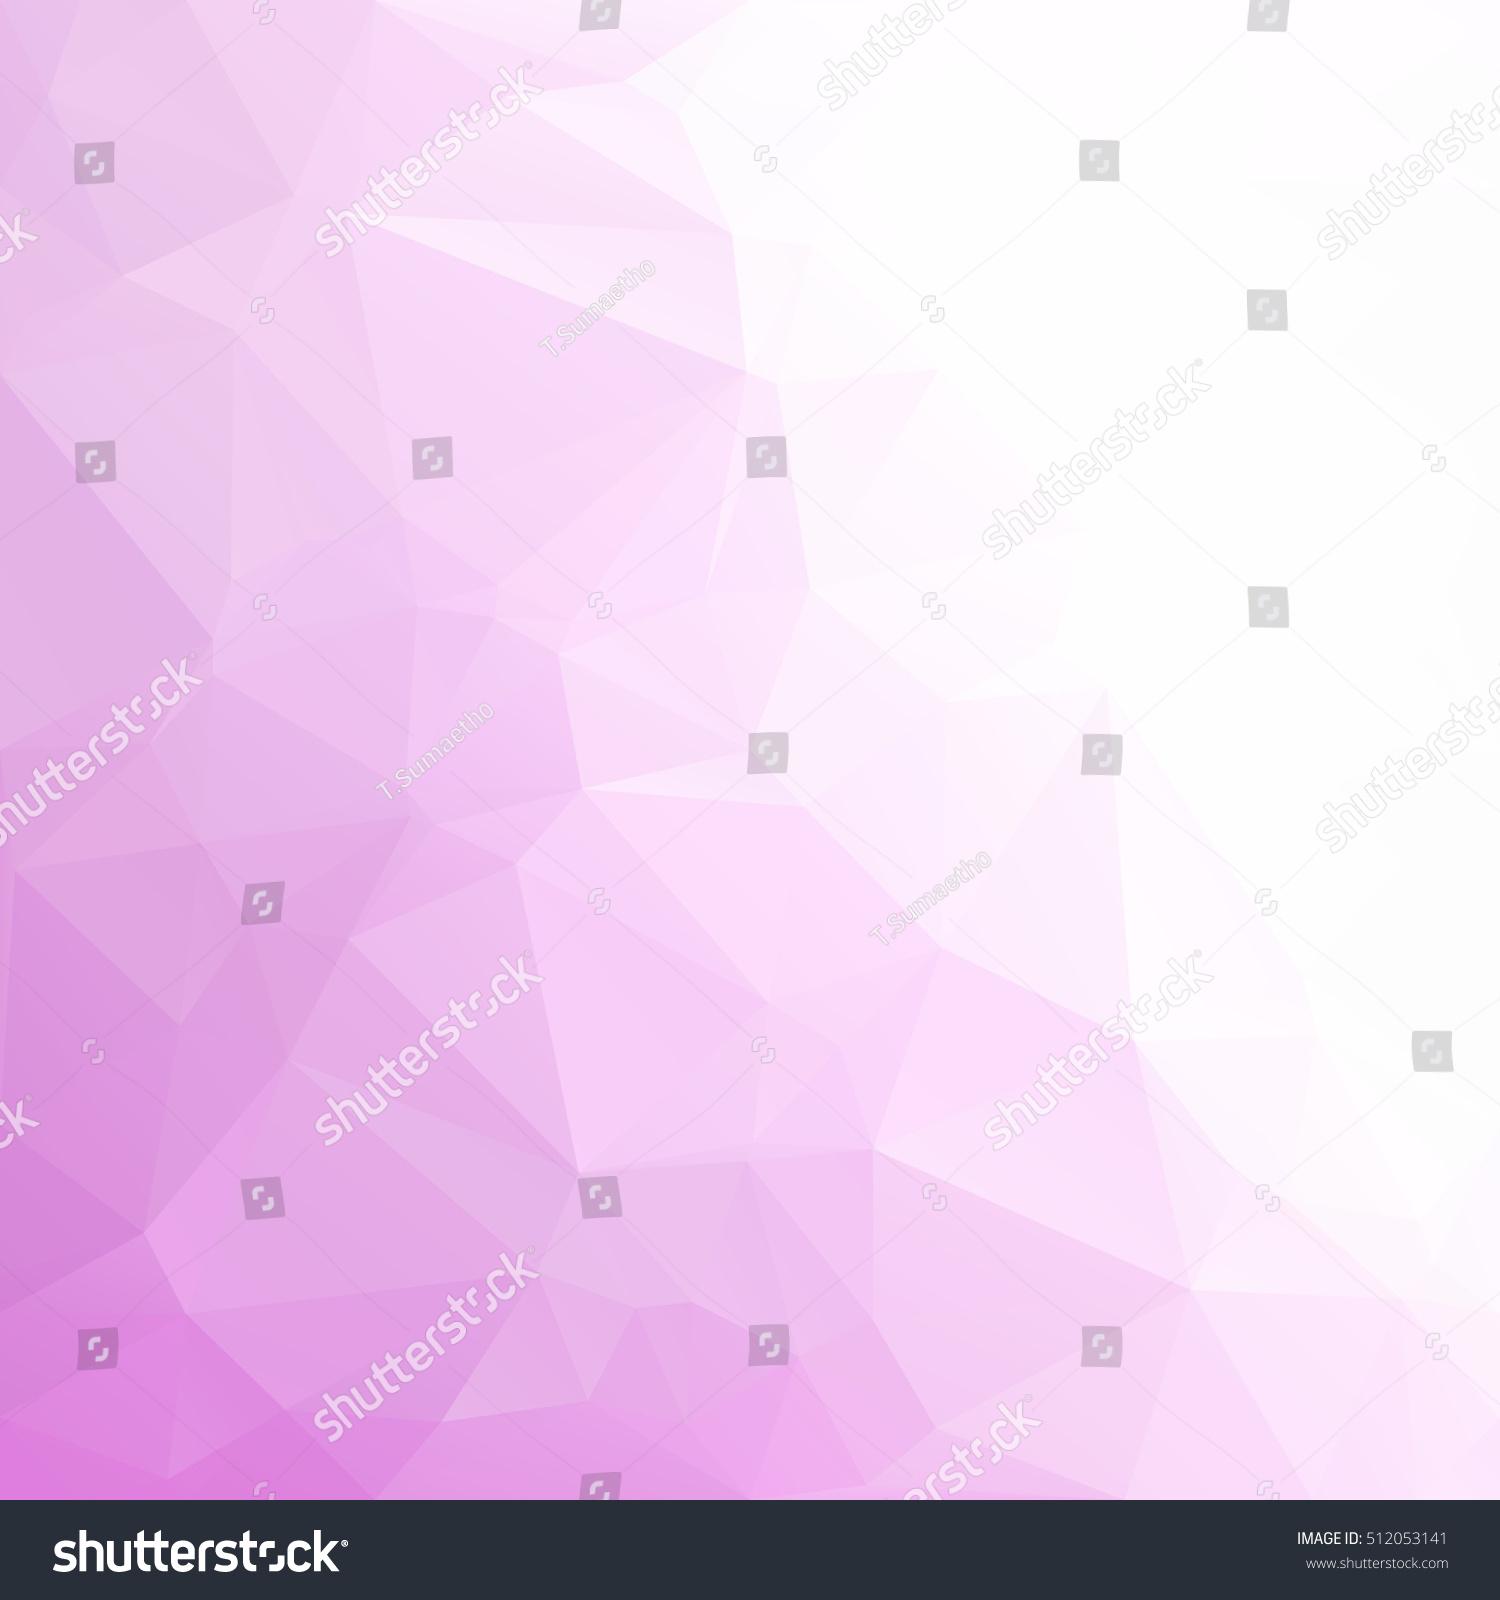 abstract triangular pink violet white blue background | ez canvas